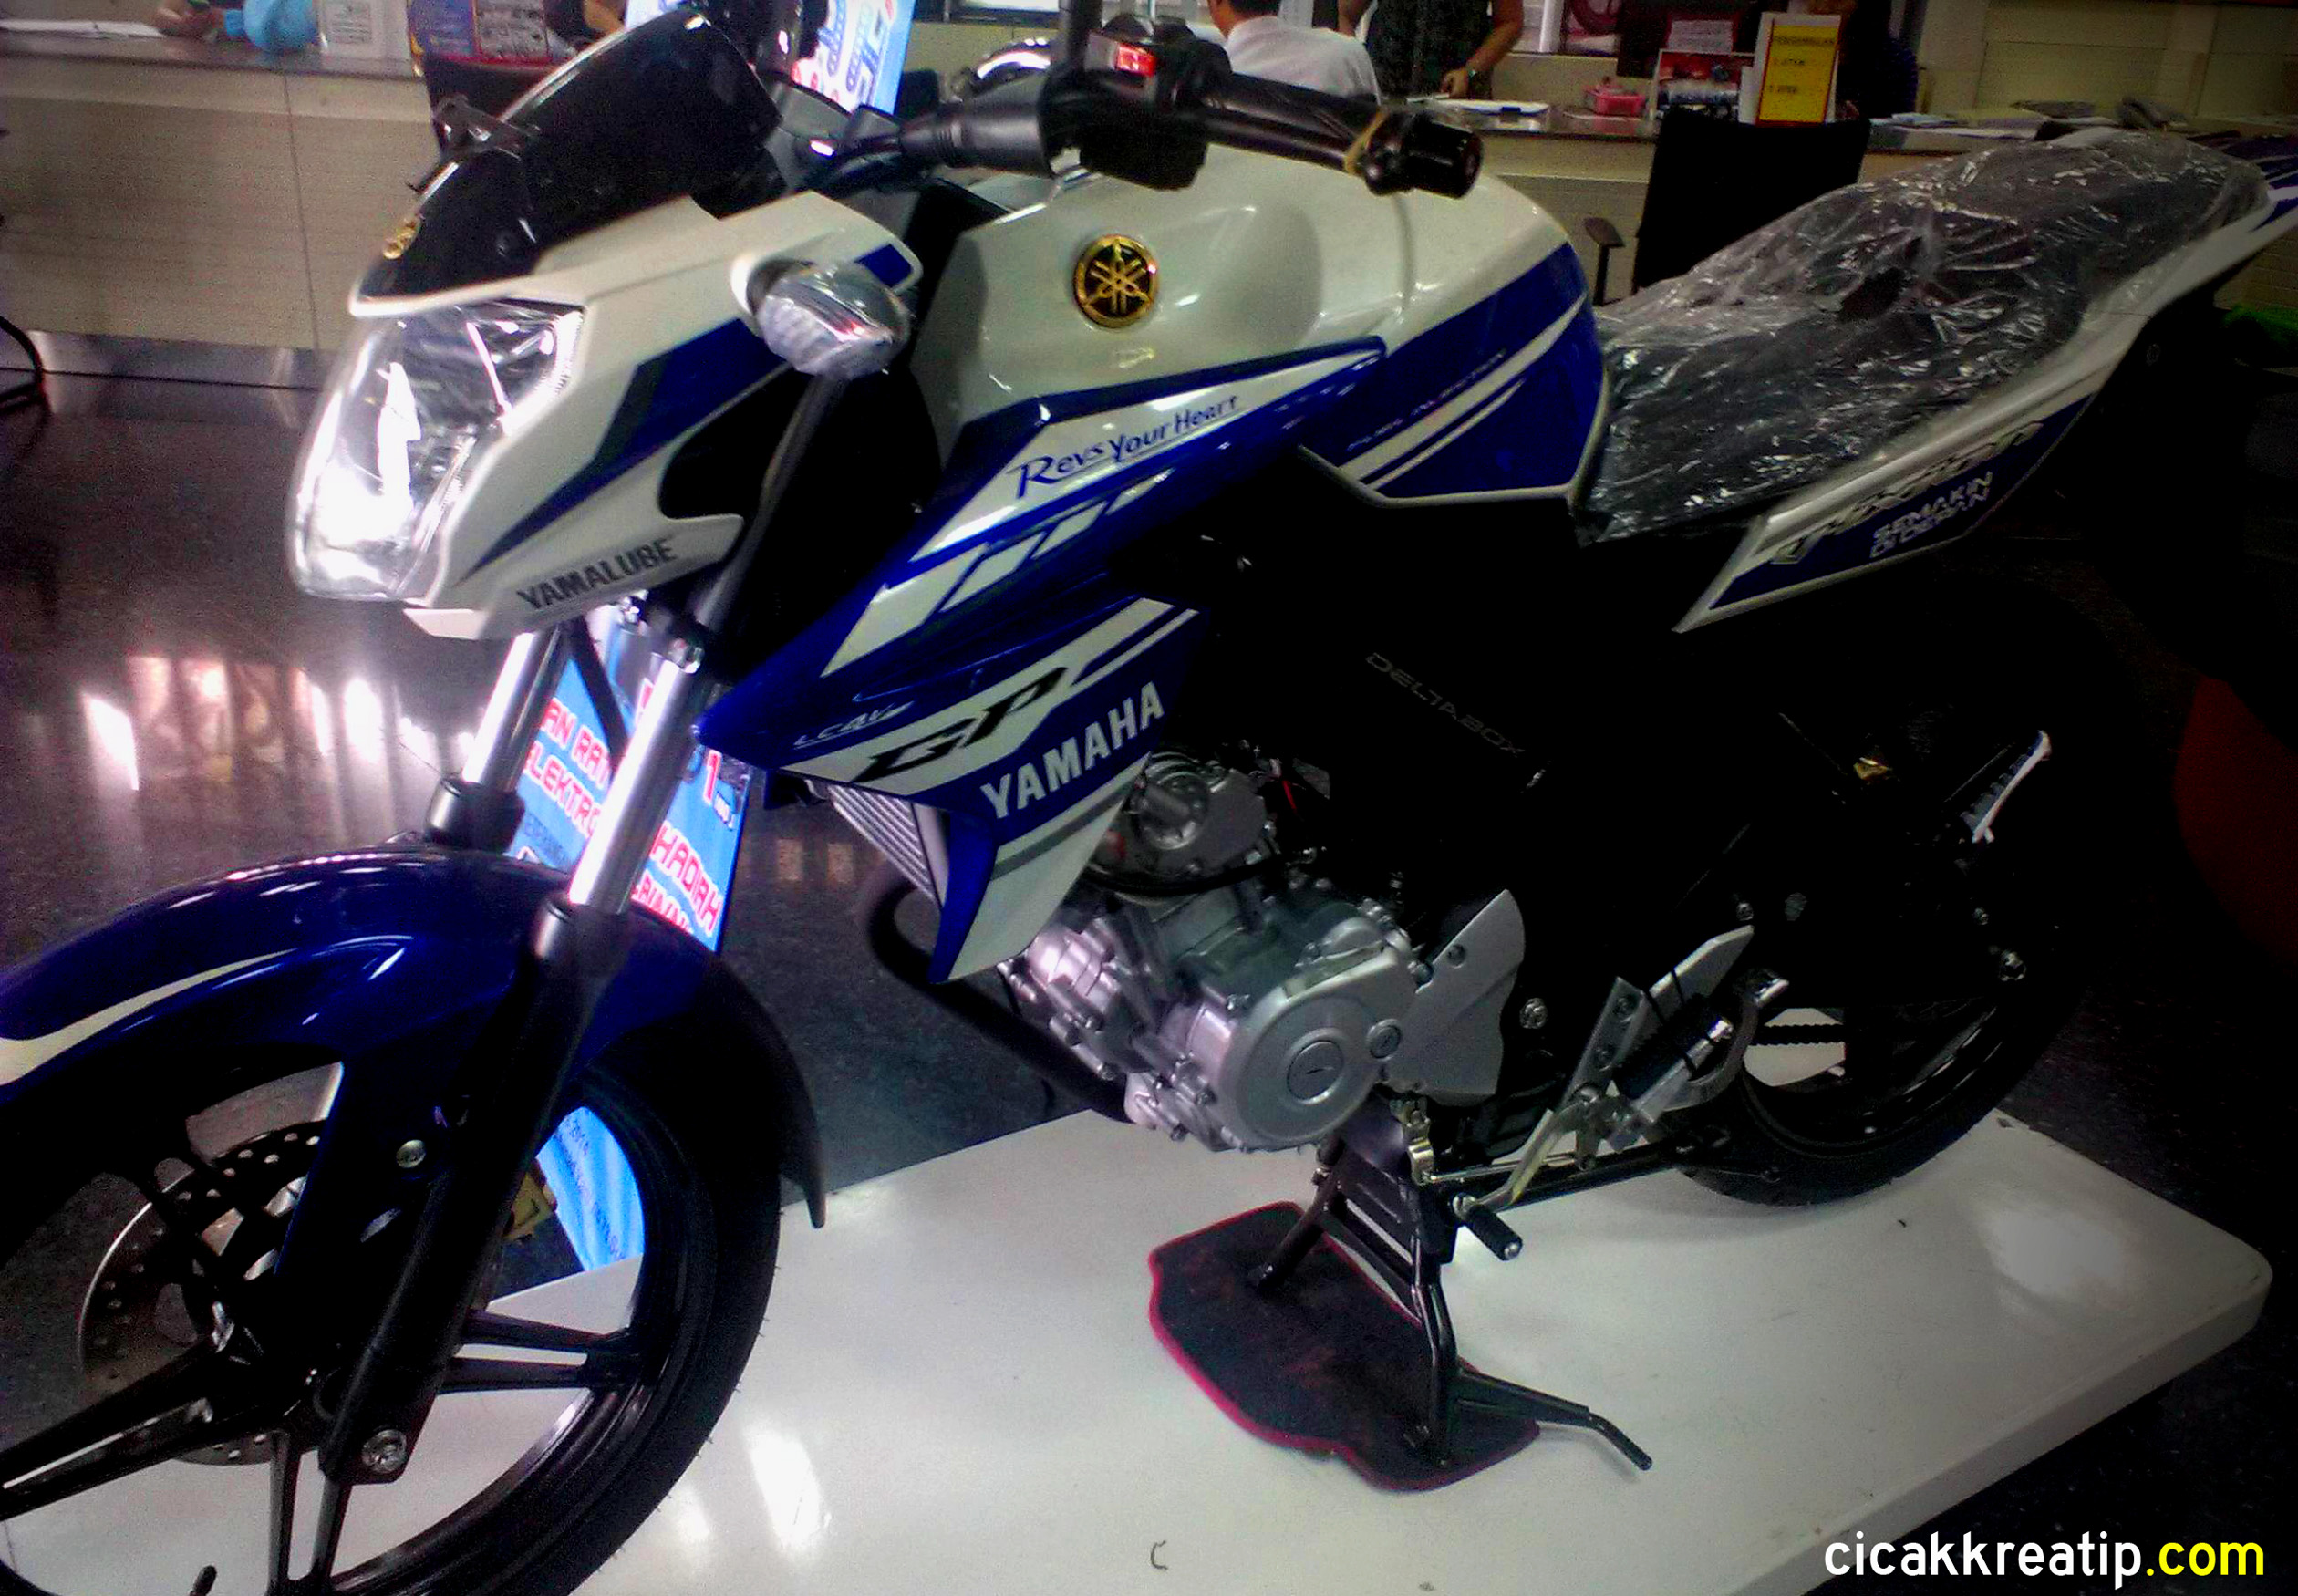 Harga Yamaha New Vixion Lightning Livery MotoGP 2014 Selisihnya